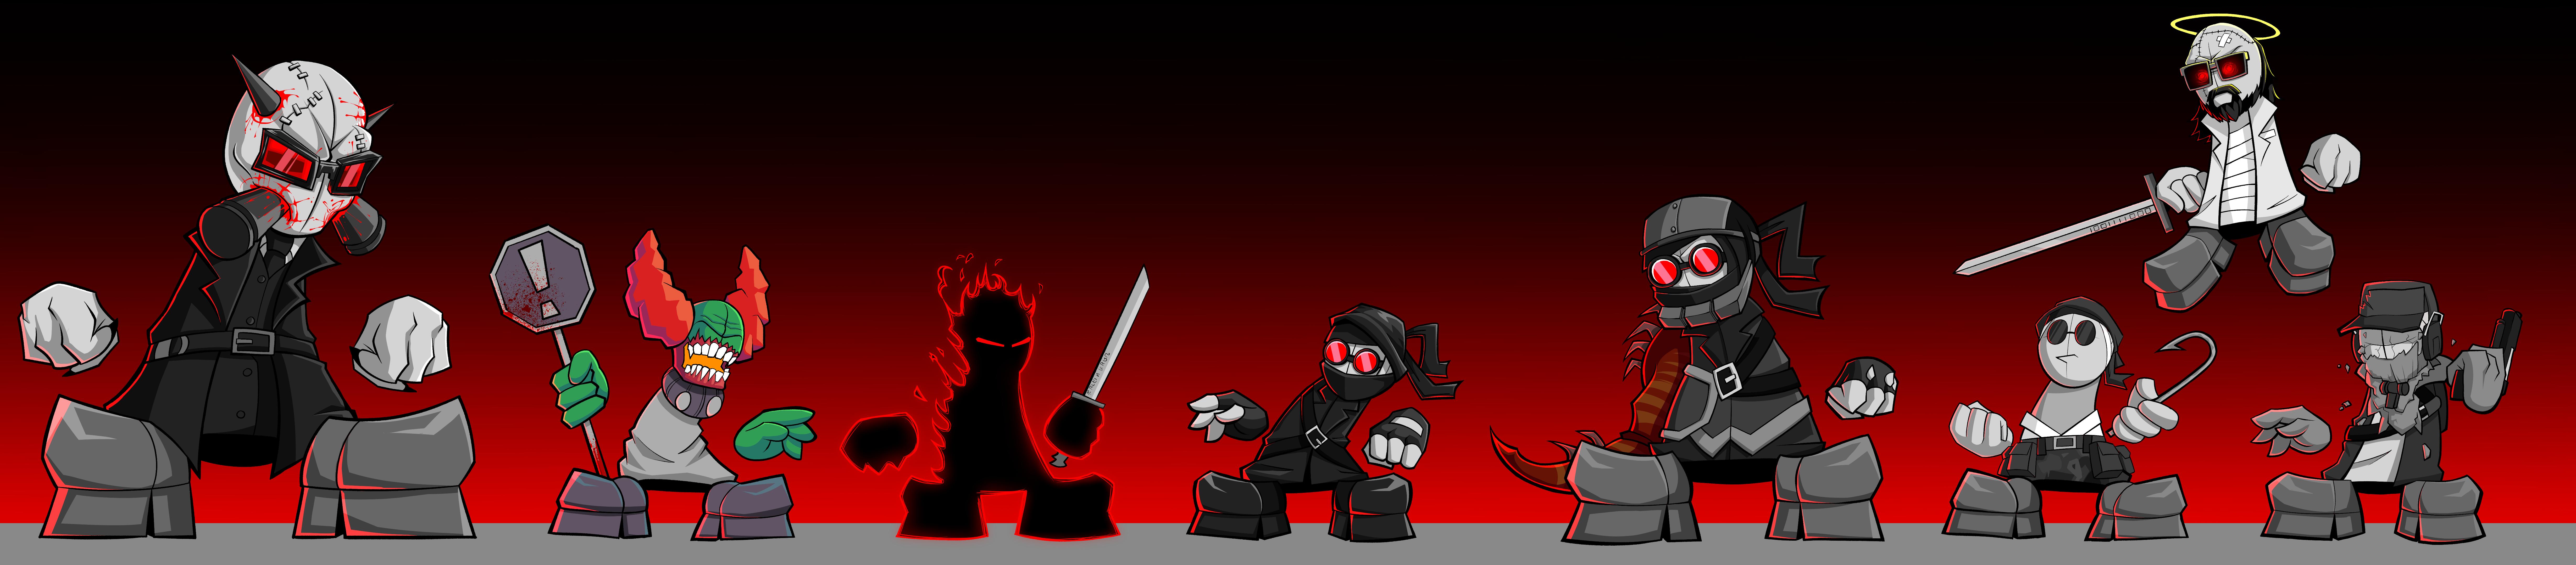 madness combat designs